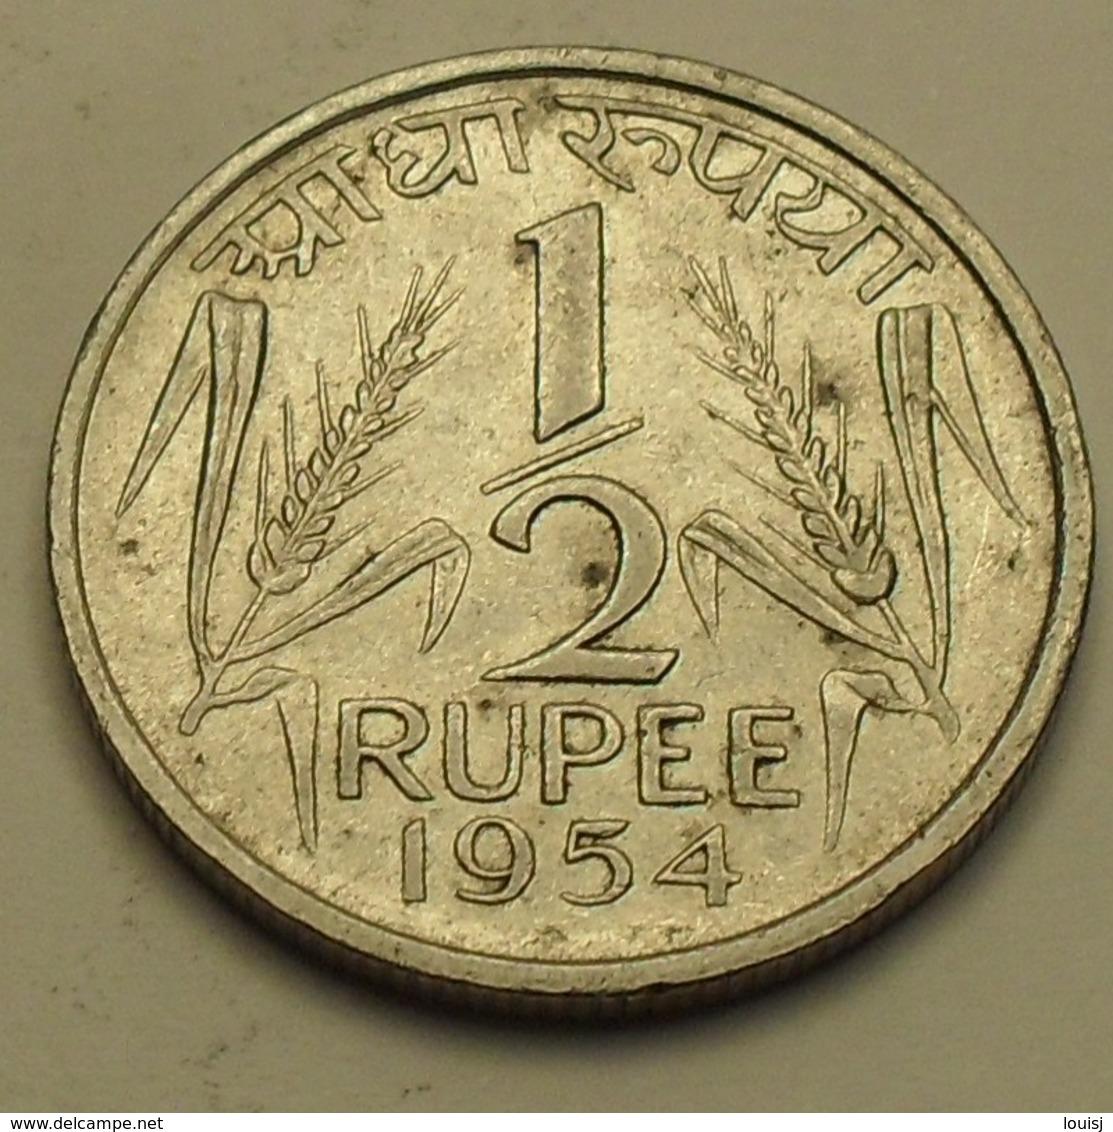 1954 - Inde République - India Republic - 1/2 RUPEE, Calcutta, KM 6.2 - Inde